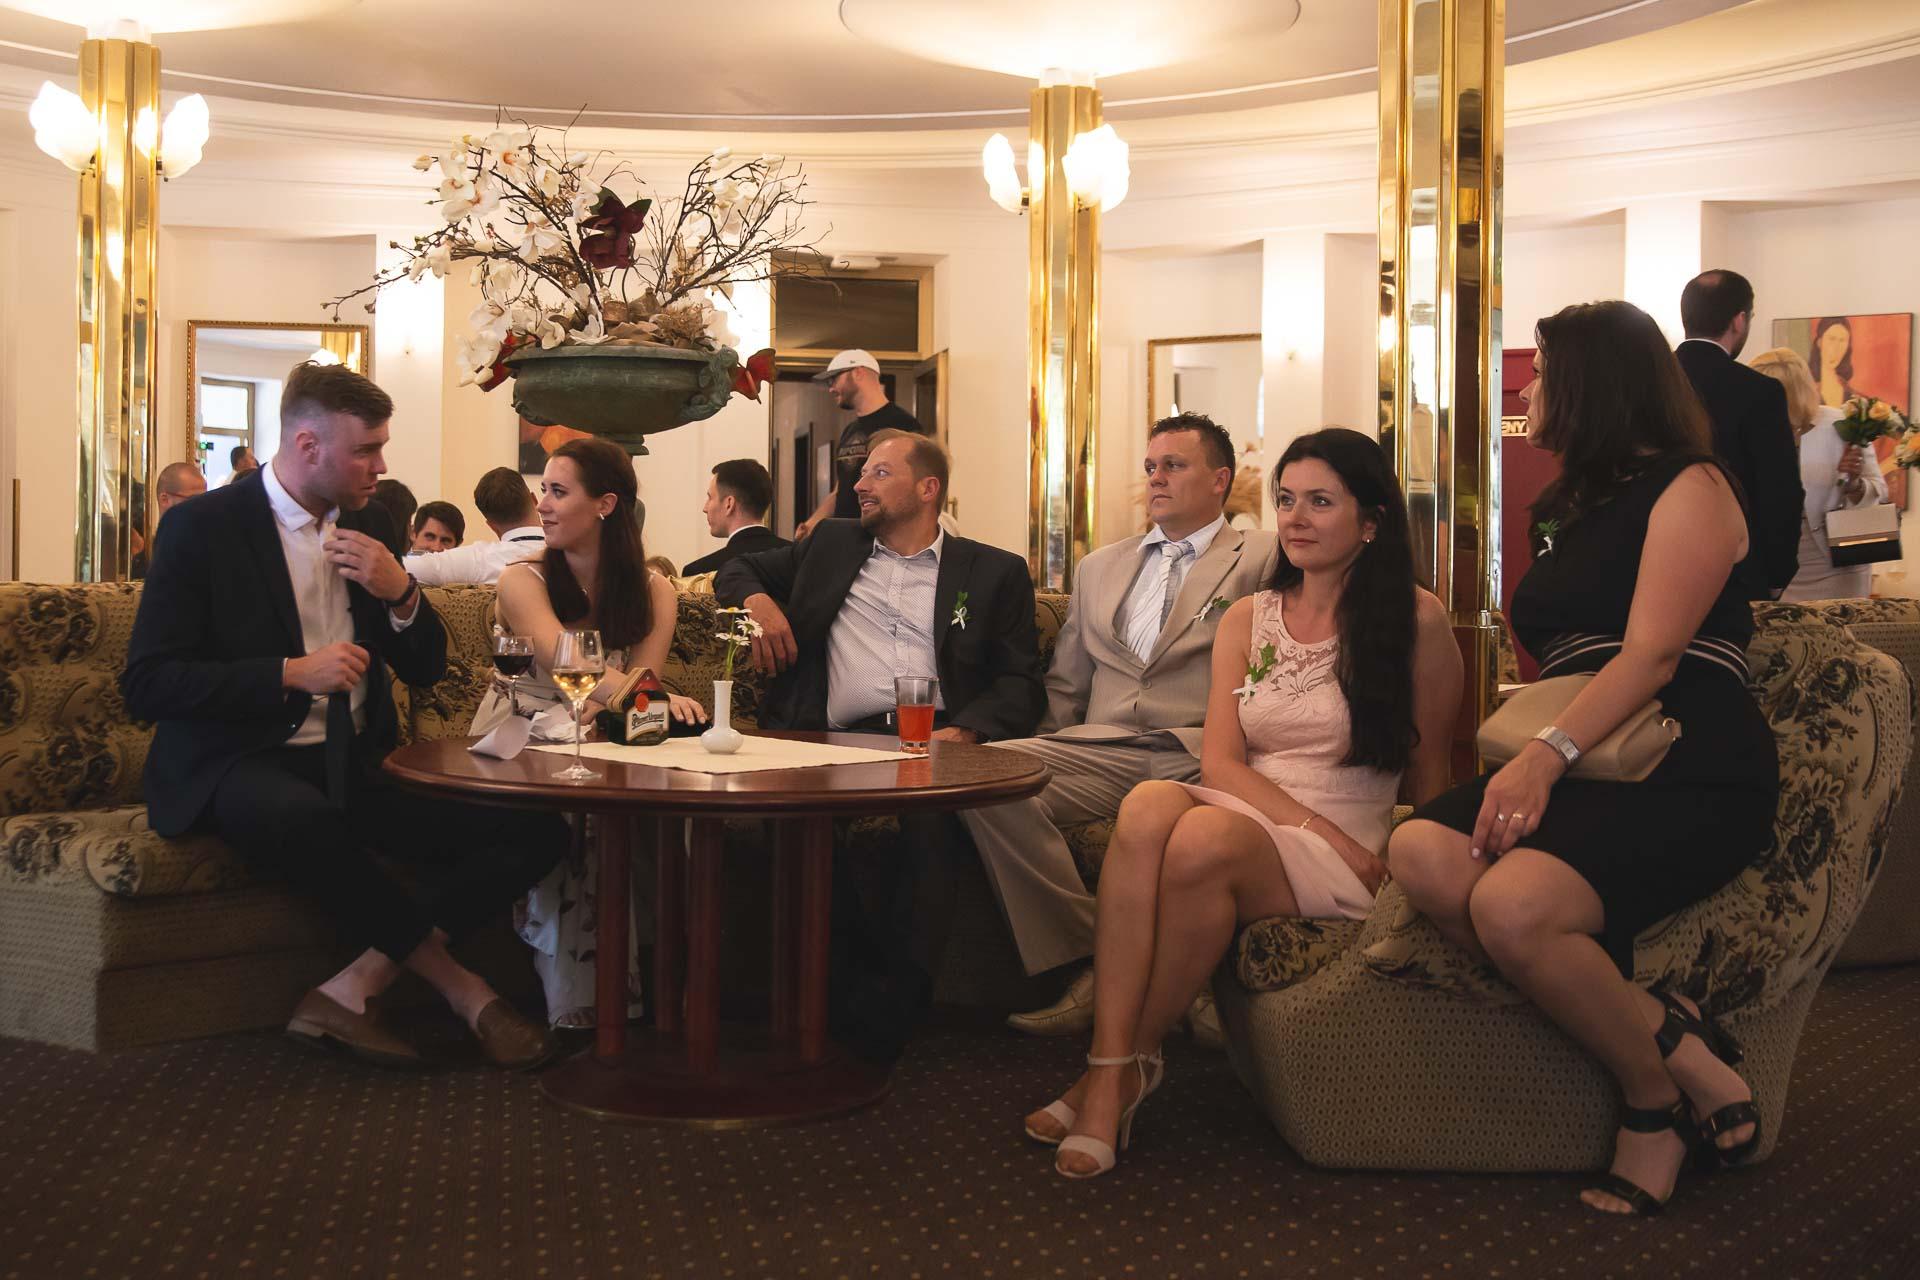 svatební-fotograf-svatebni-video-Nymburk-hotel-Ostrov-Beautyfoto-5900